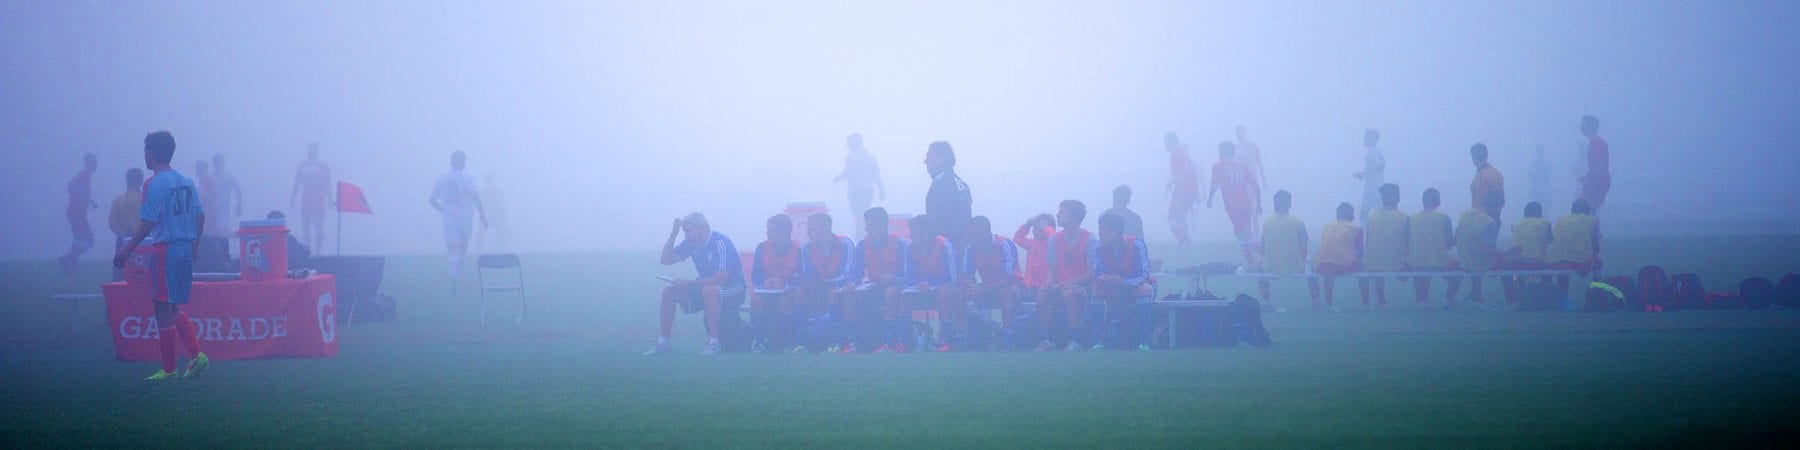 Boston Soccer Club U16 Team vs. D Force